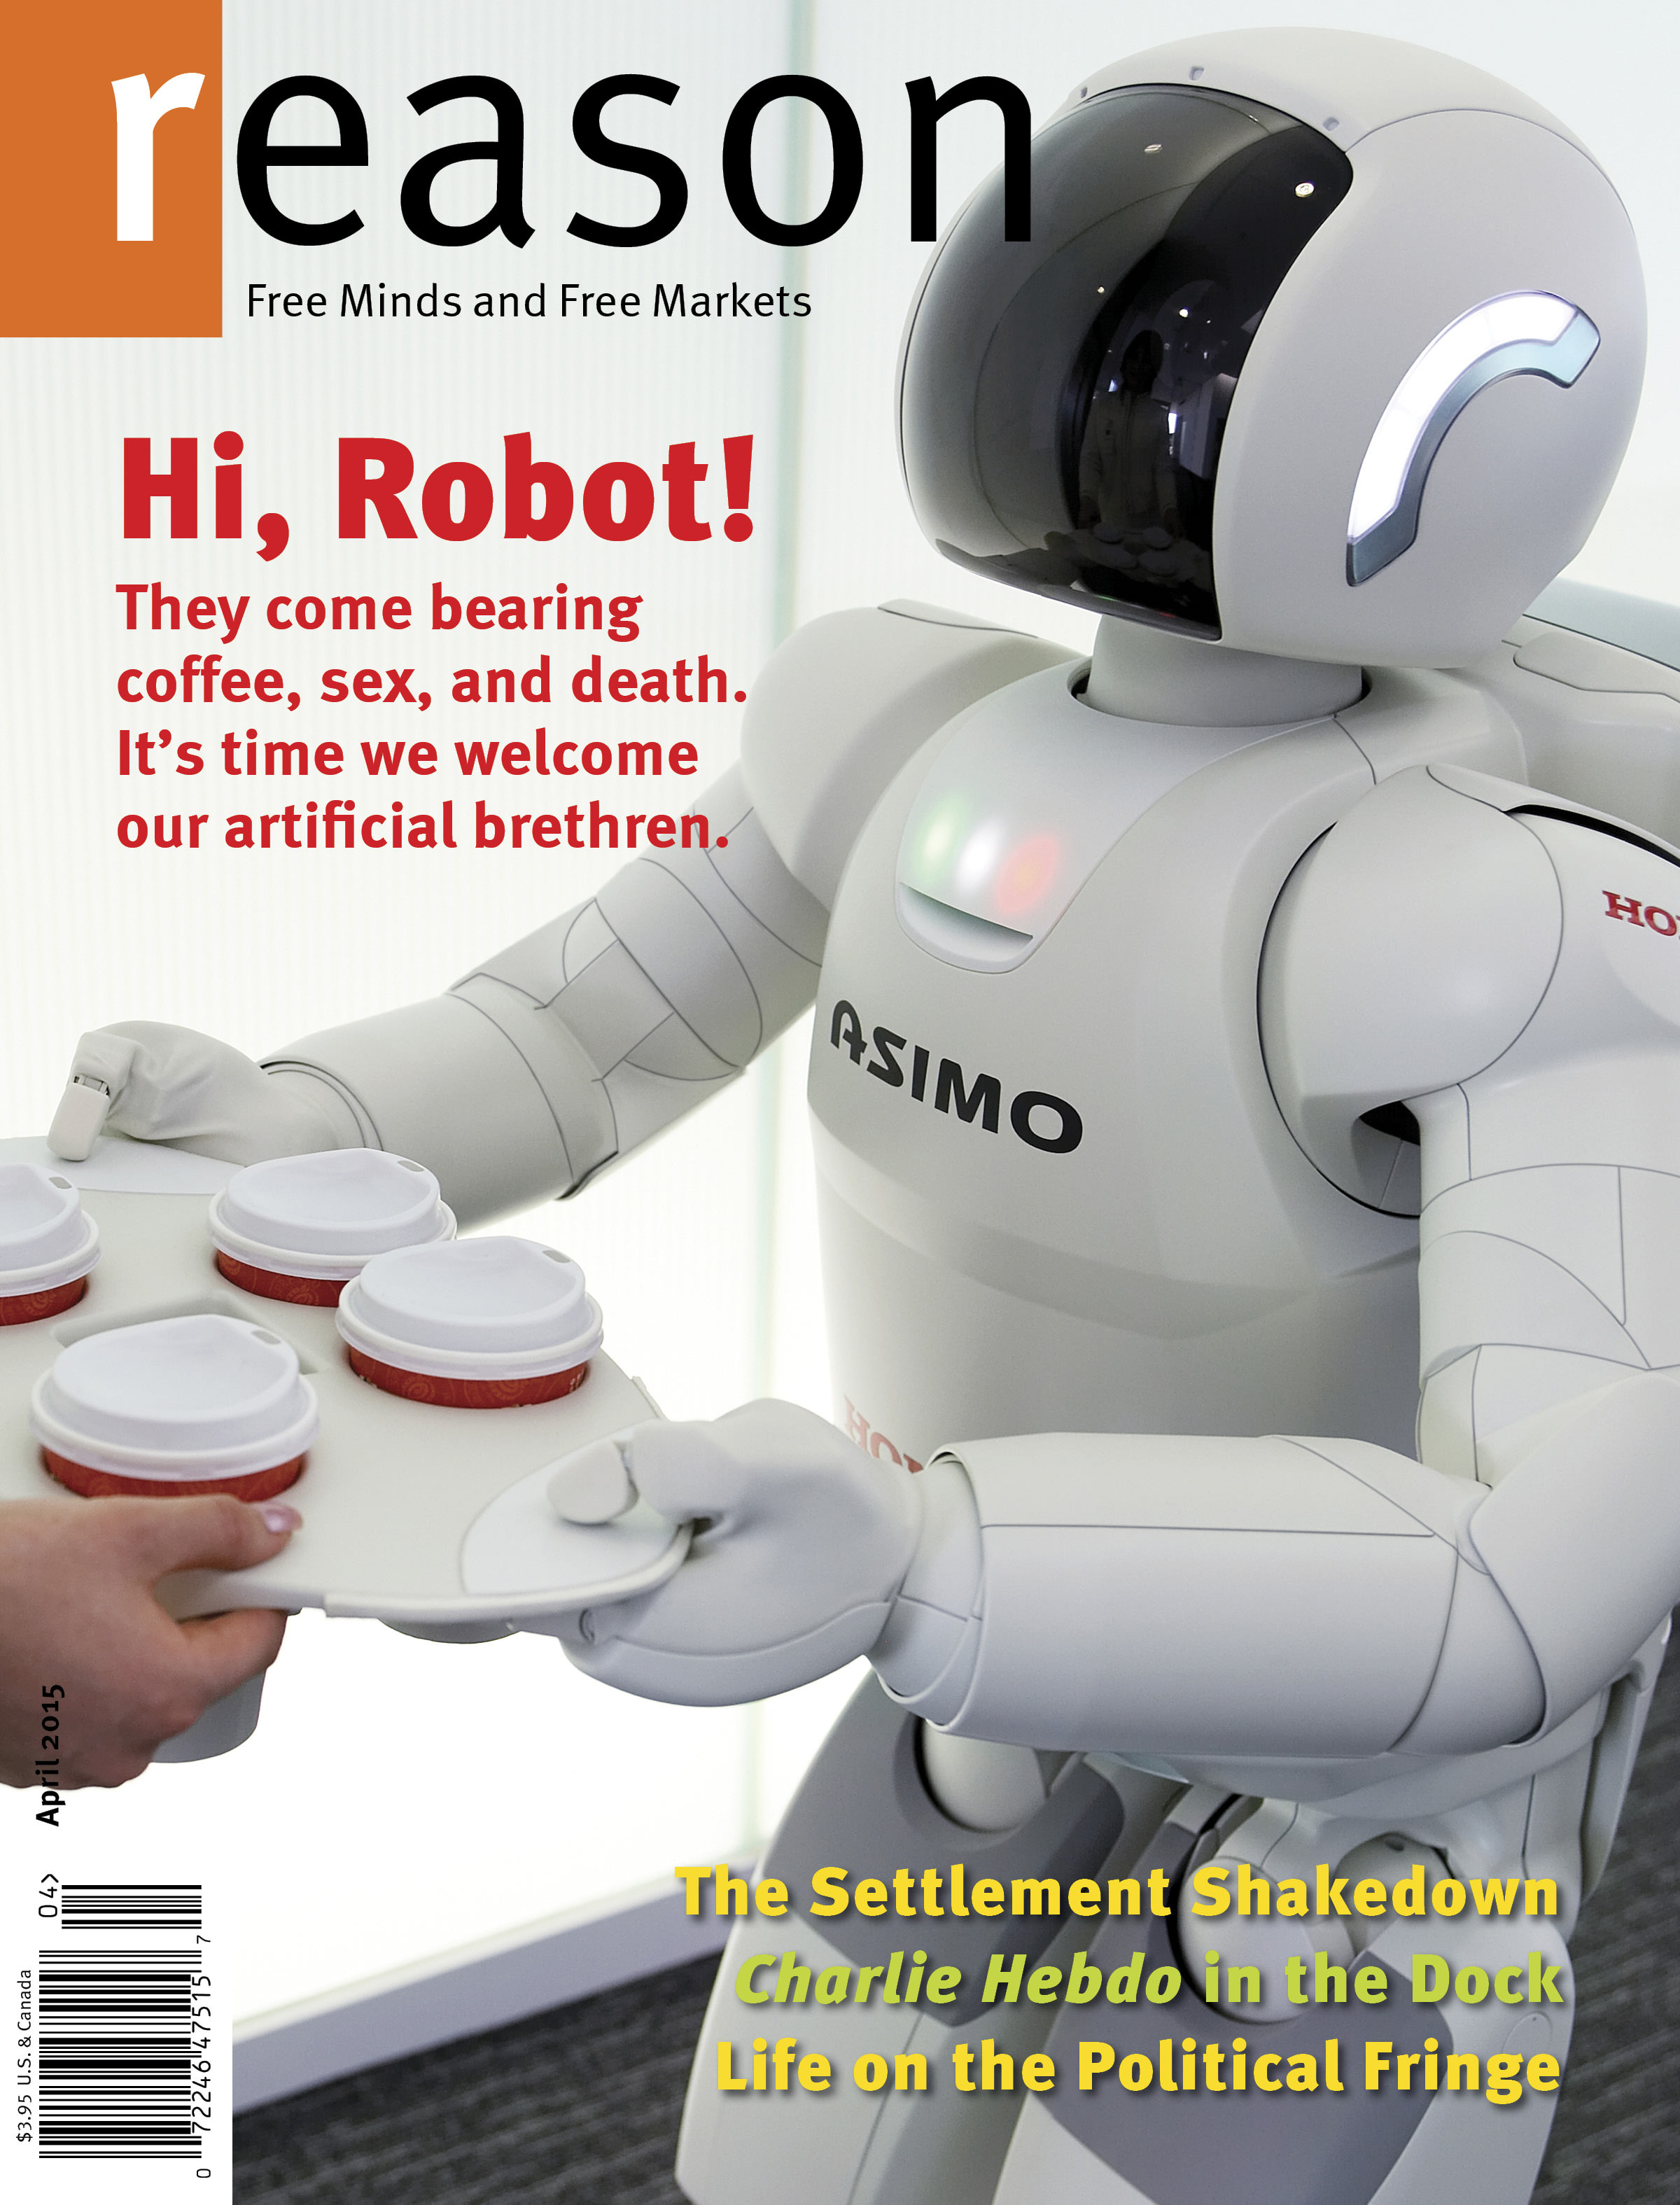 Reason Magazine, April 2015 cover image